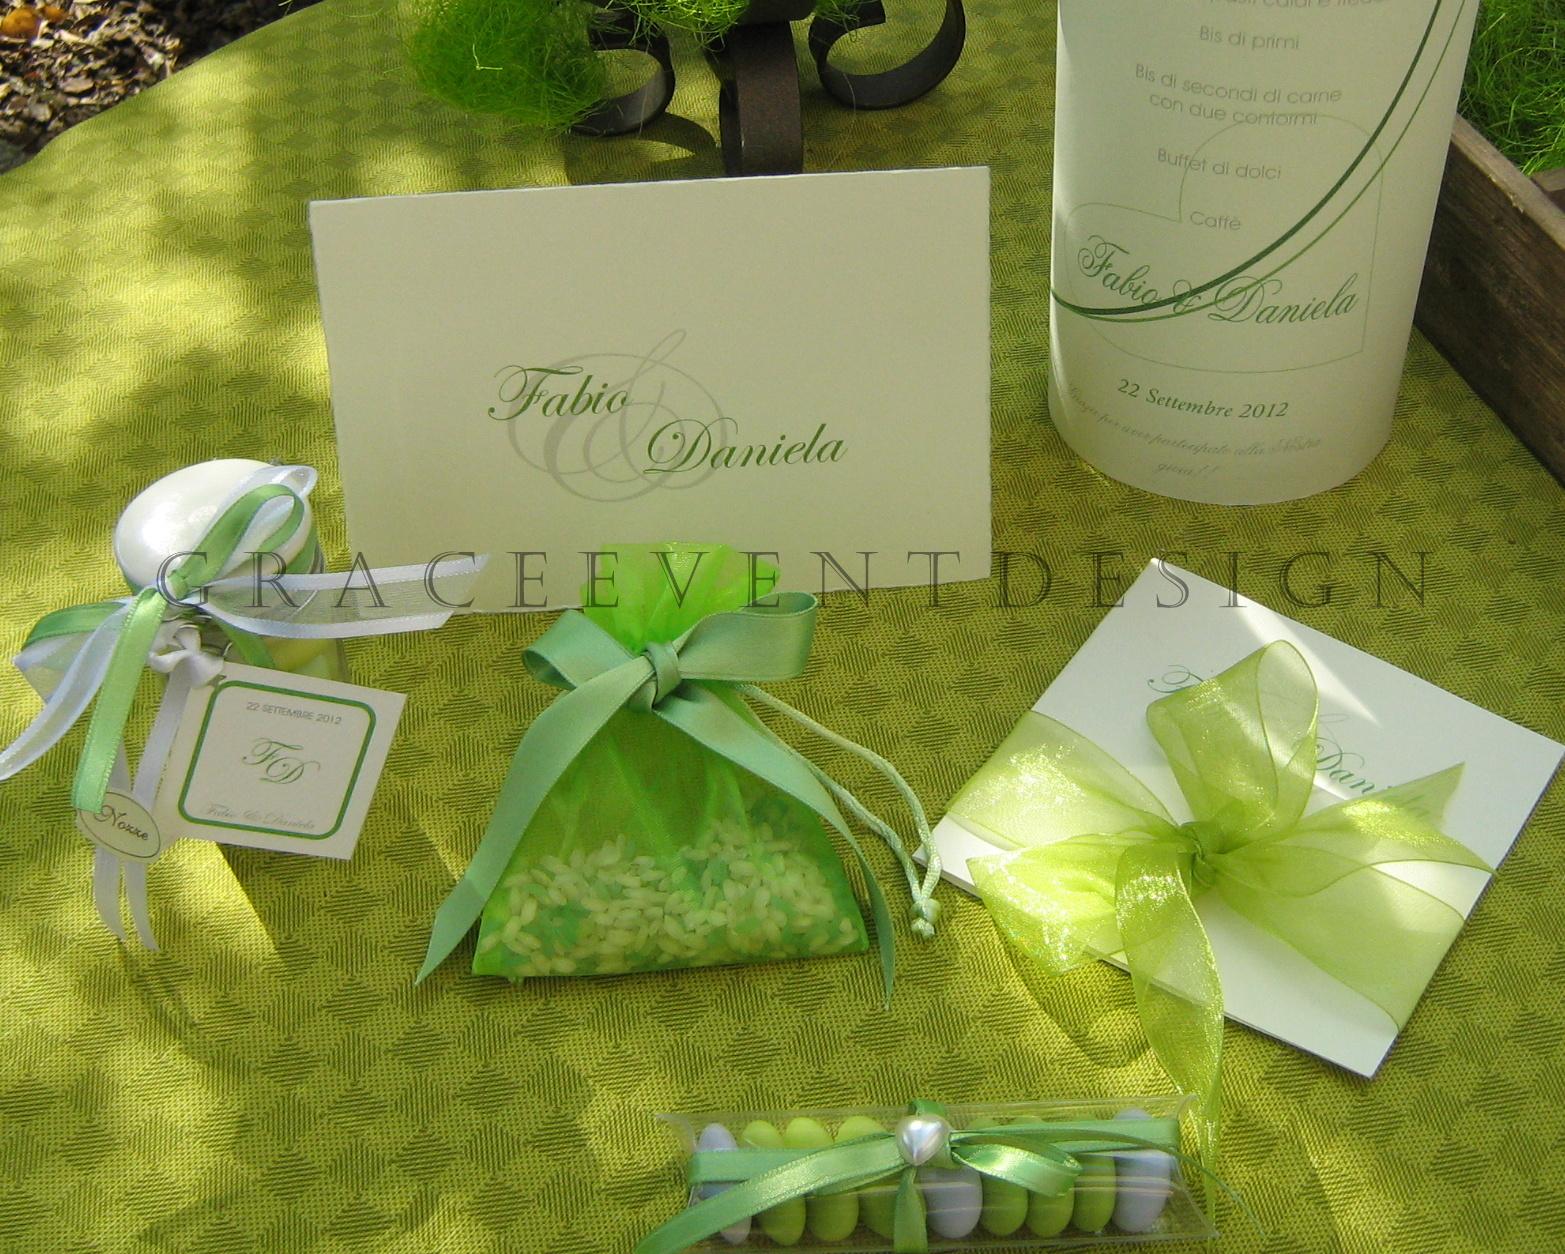 Matrimonio Tema Verde : Nozzeeventi bio ed eco chic tema verde per un matrimonio